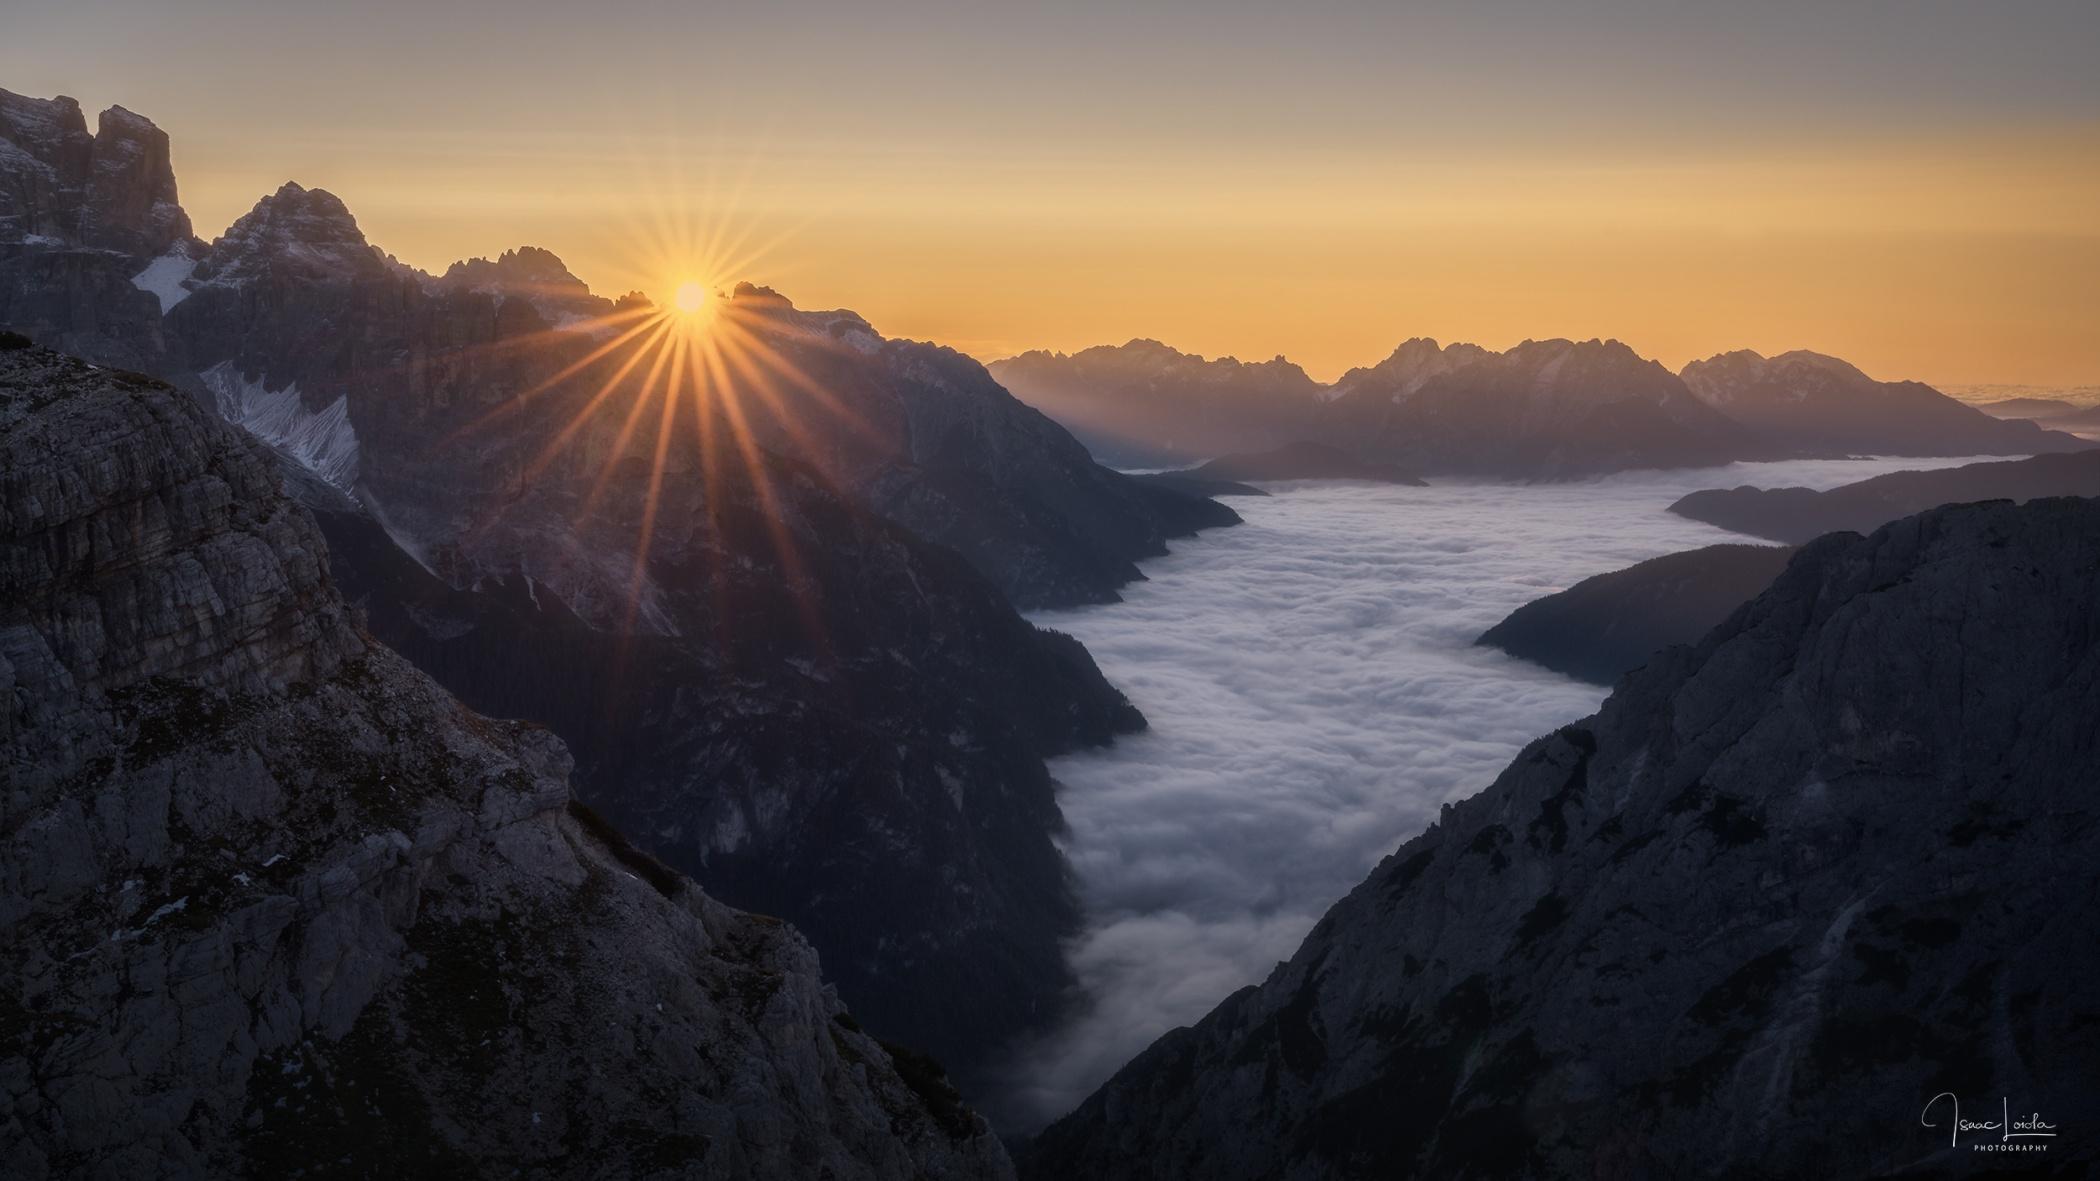 Panorámica al amanecer - Mountain lights - Isaac Loiola, Photography